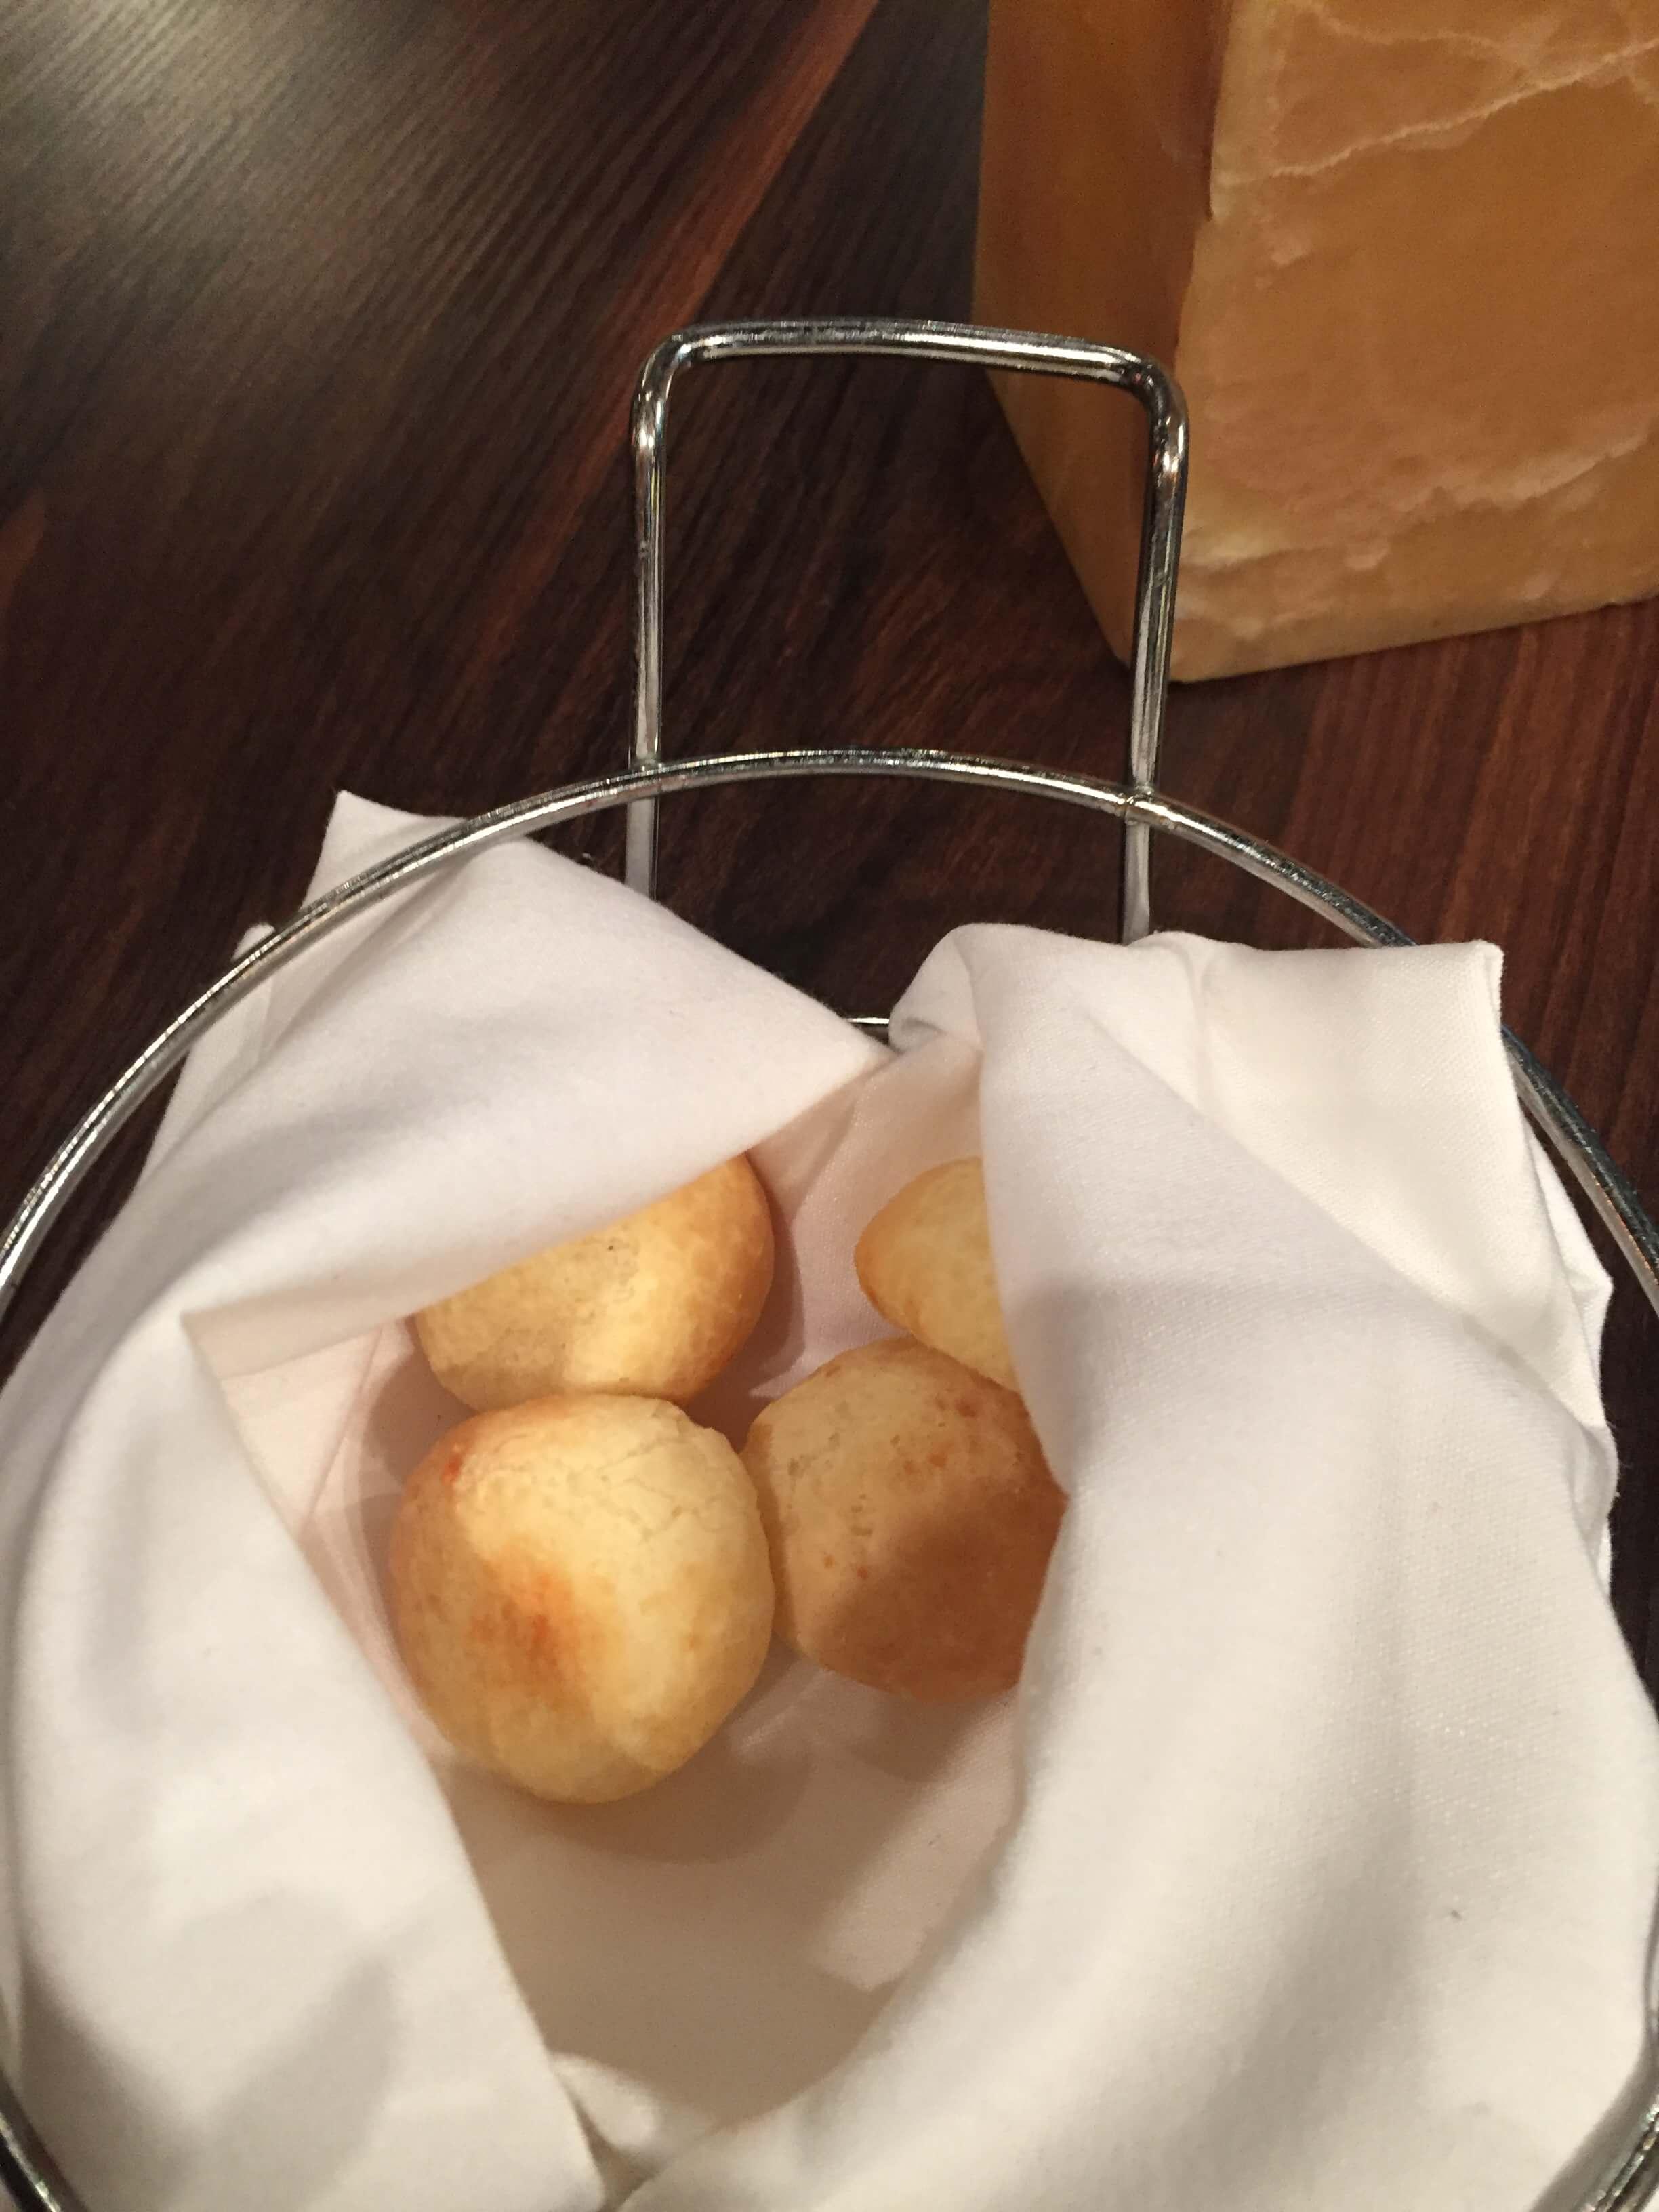 Texas de Brazil rest Woodfield Mall serves the best bread rolls